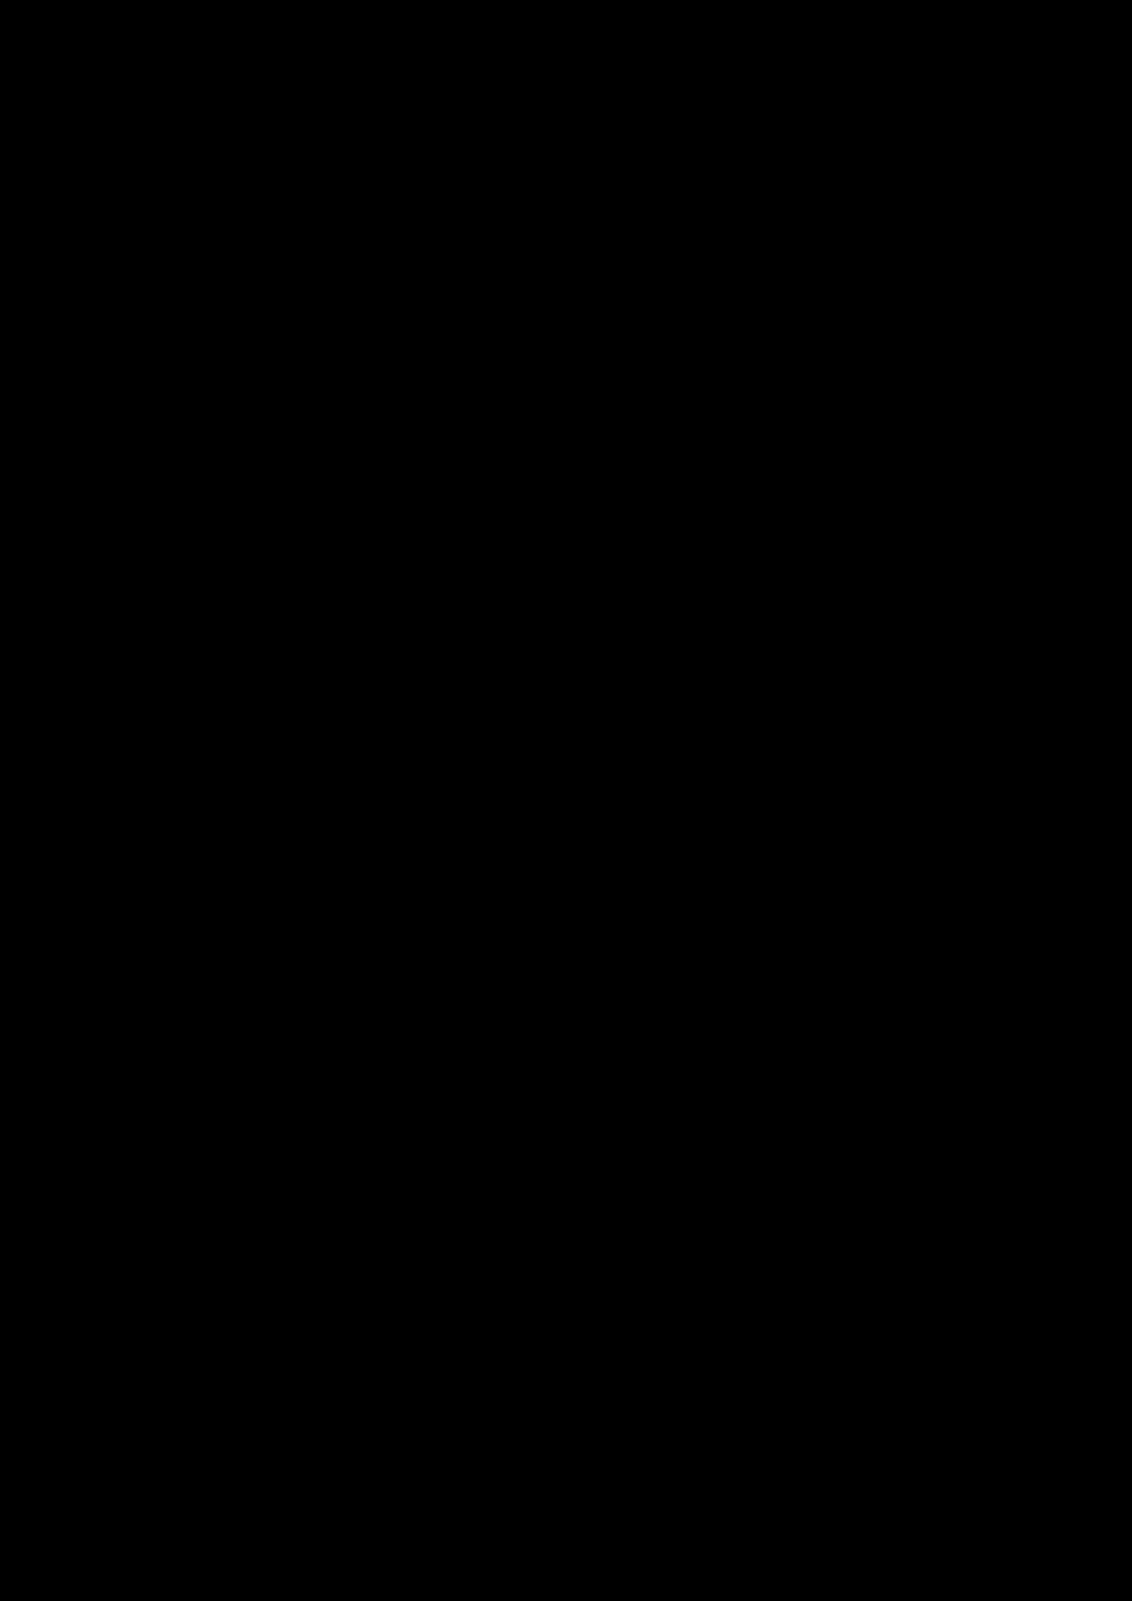 Ispoved Pervogo Boga slide, Image 63